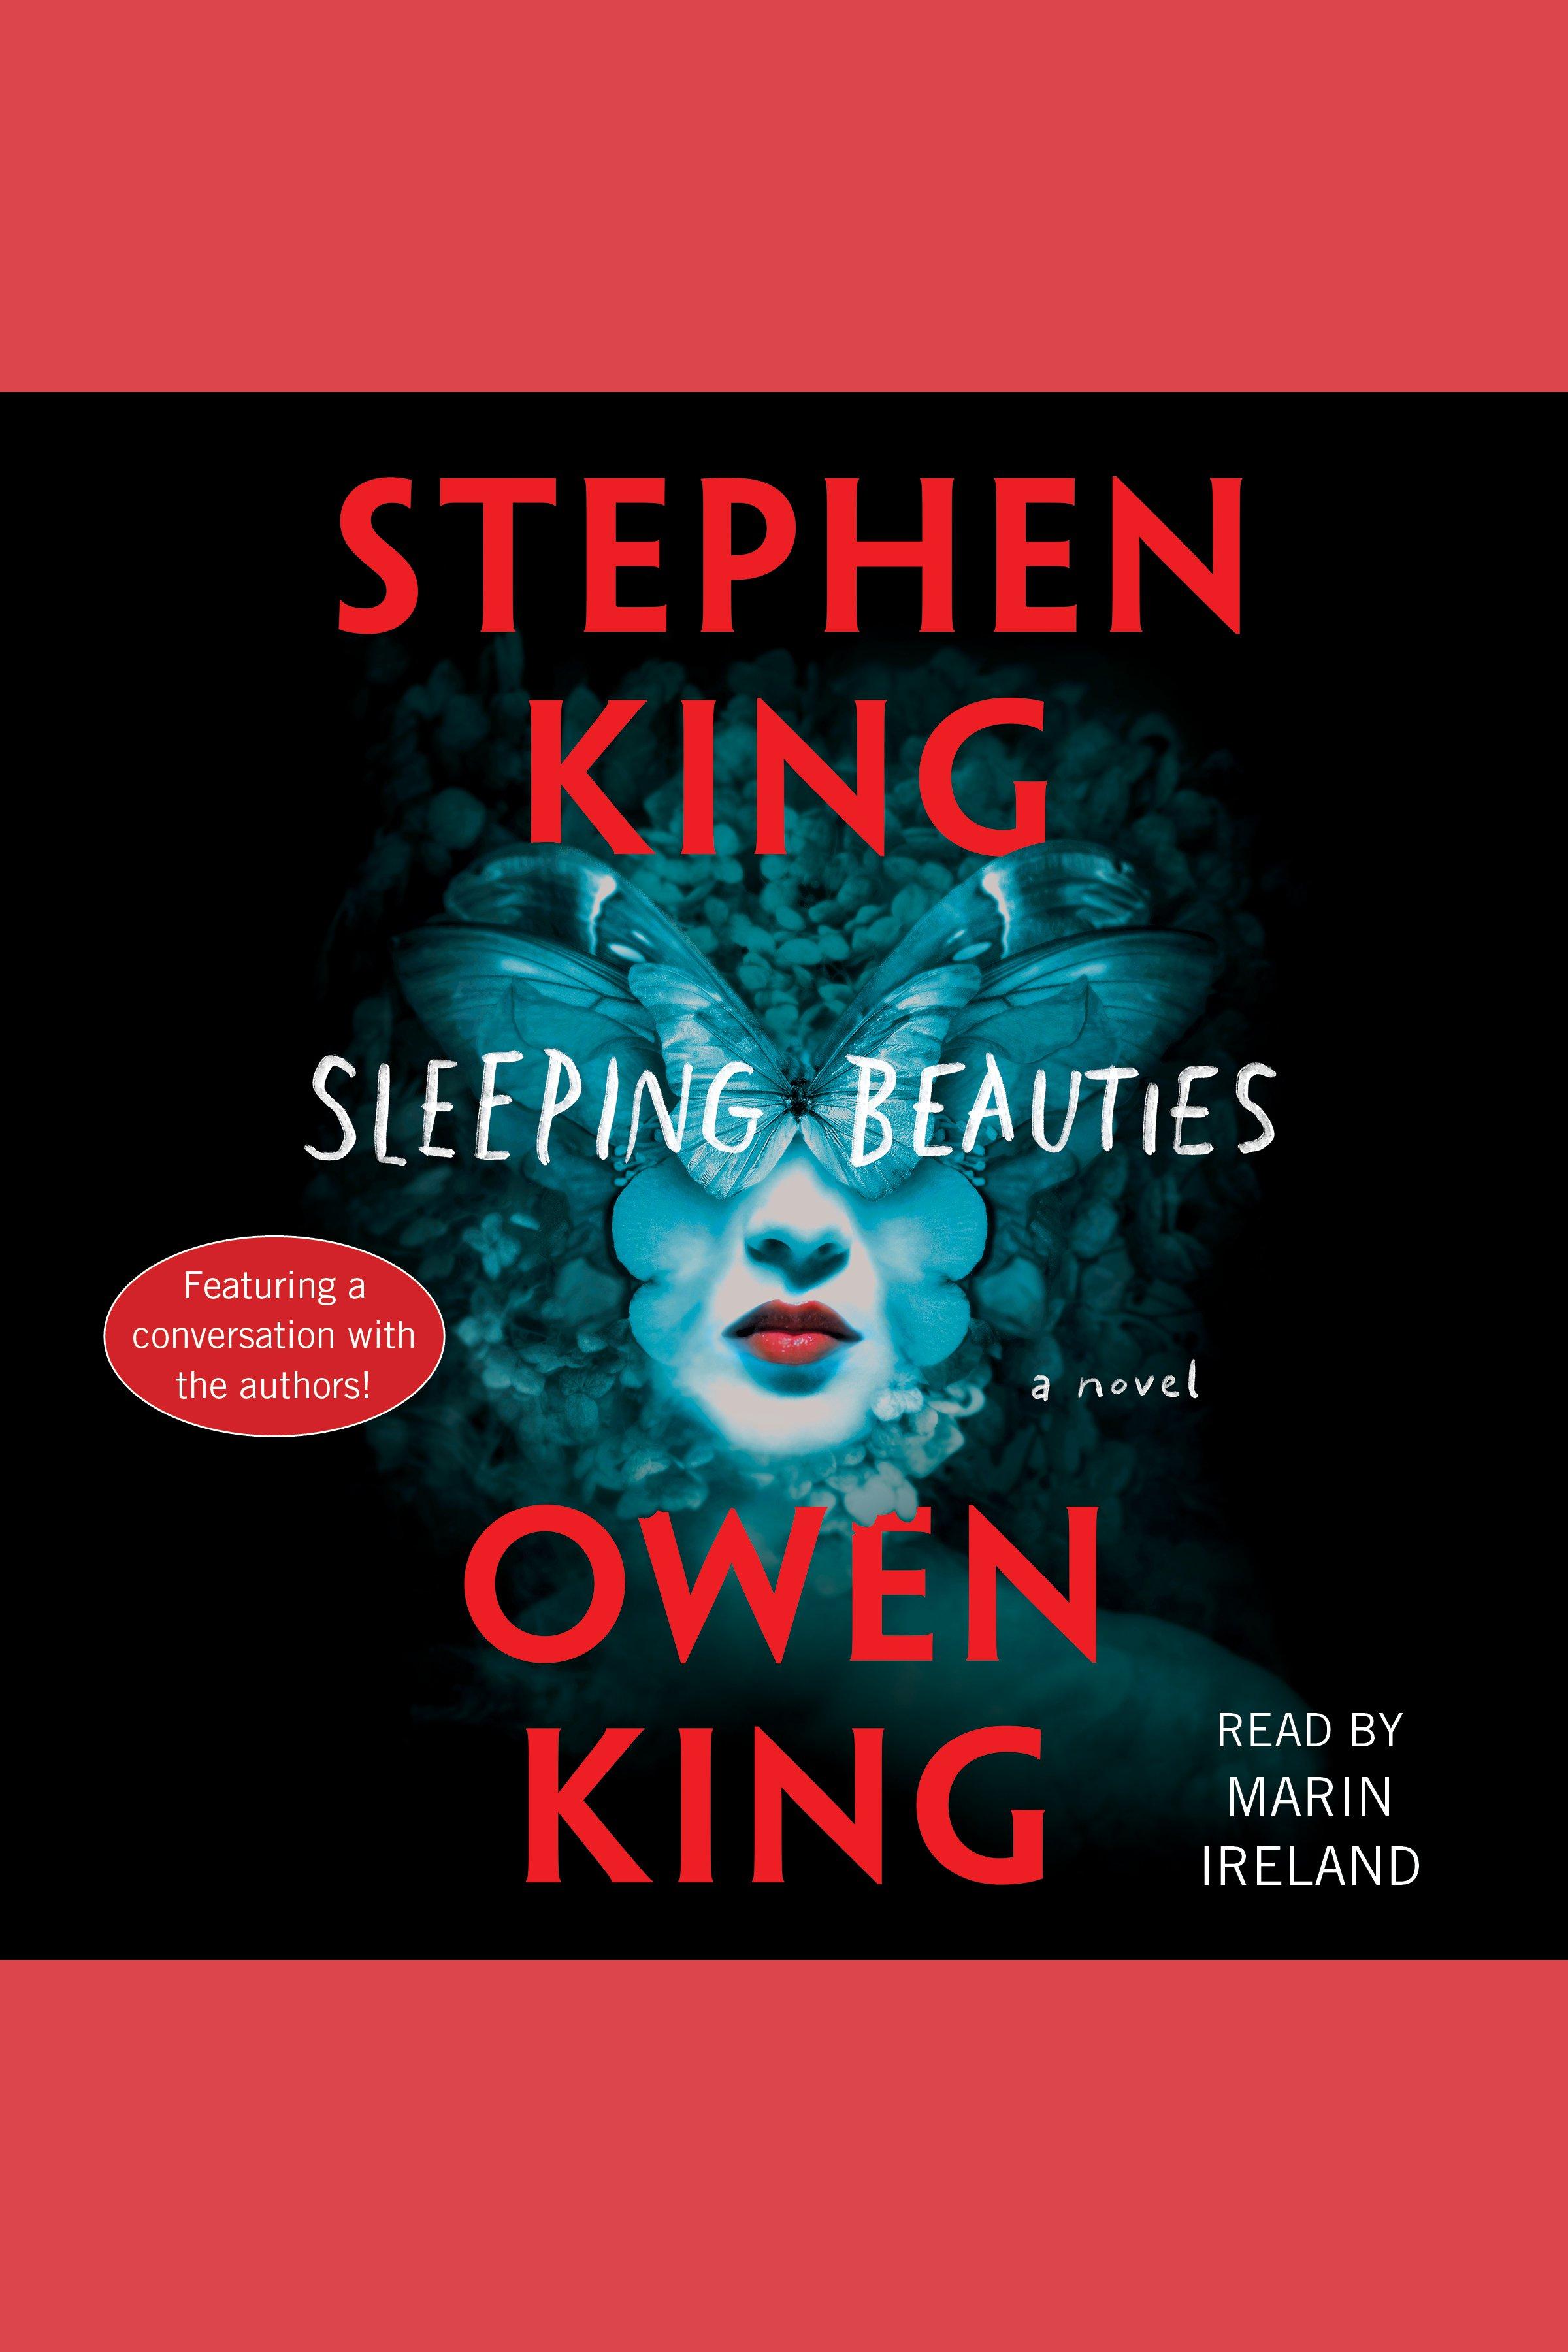 Sleeping beauties [AudioEbook] : a novel